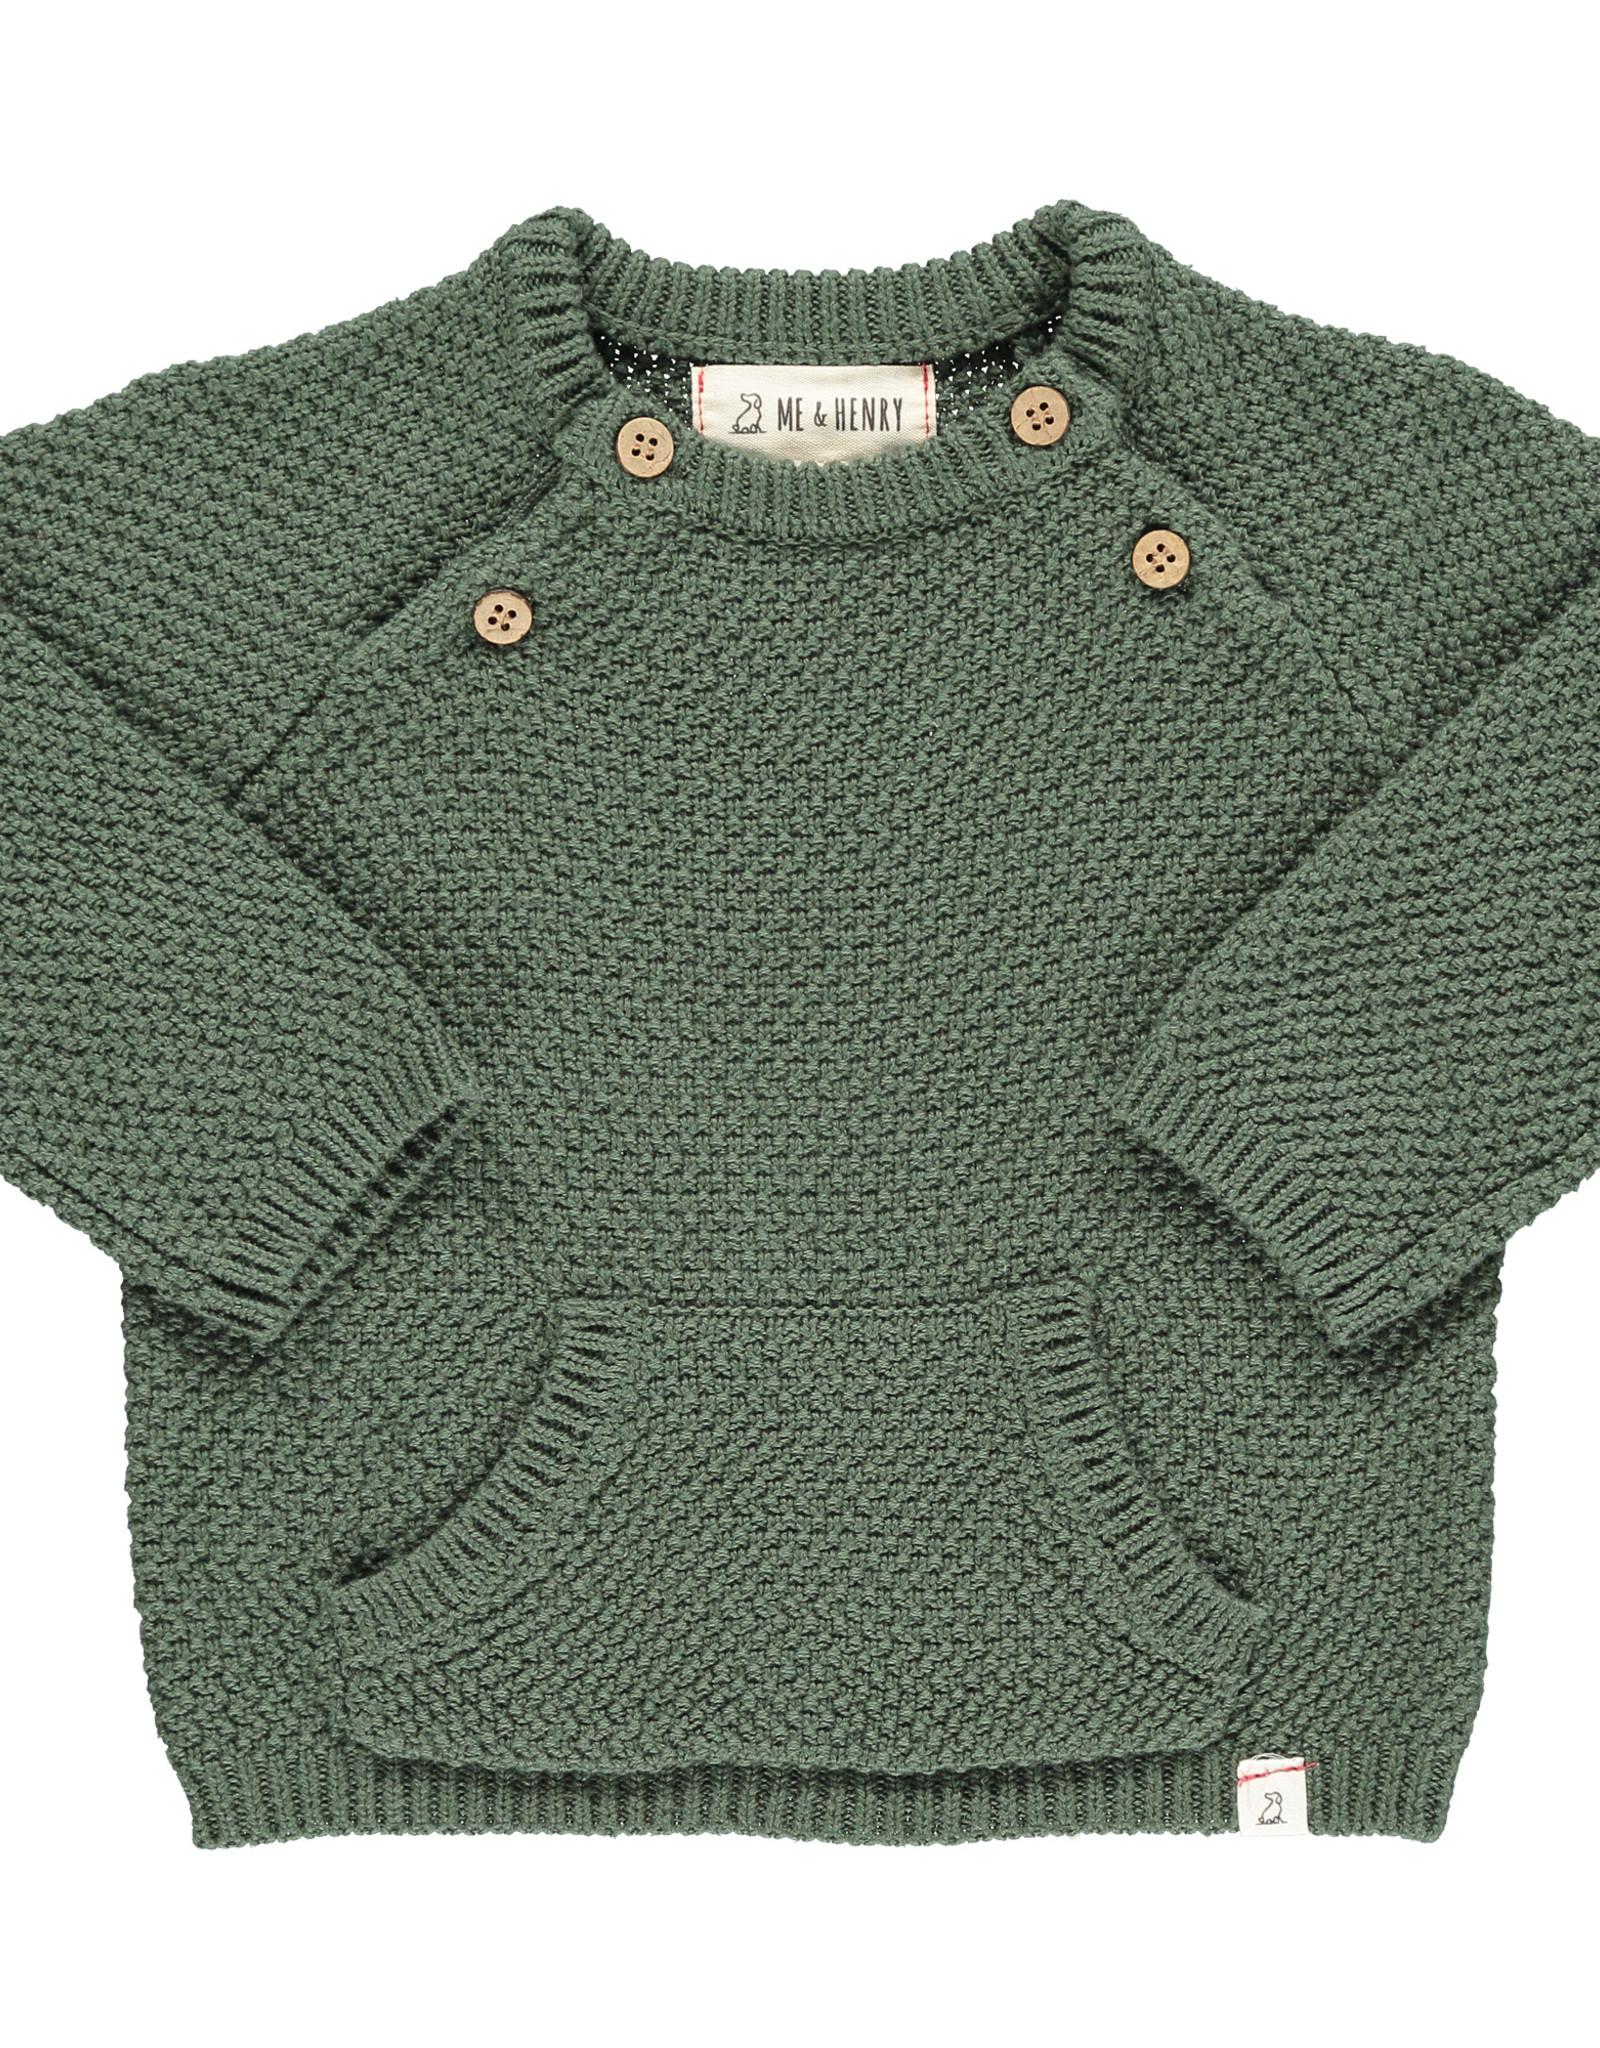 Me & Henry morrison sweater- green